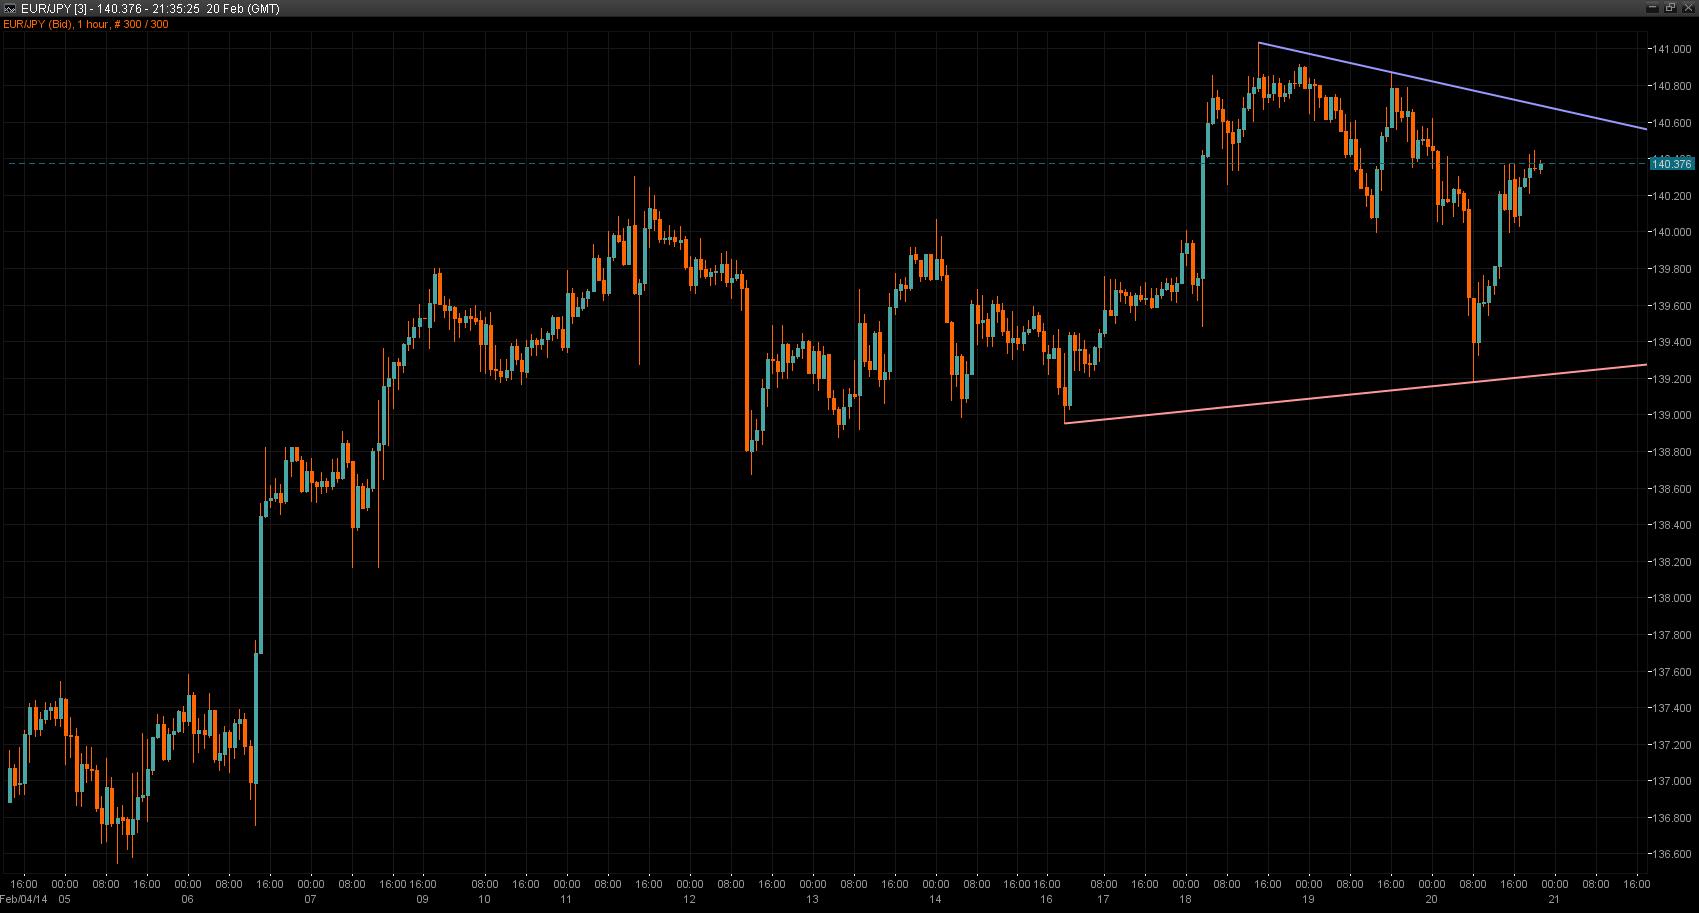 EUR/JPY chart 20/02/2014